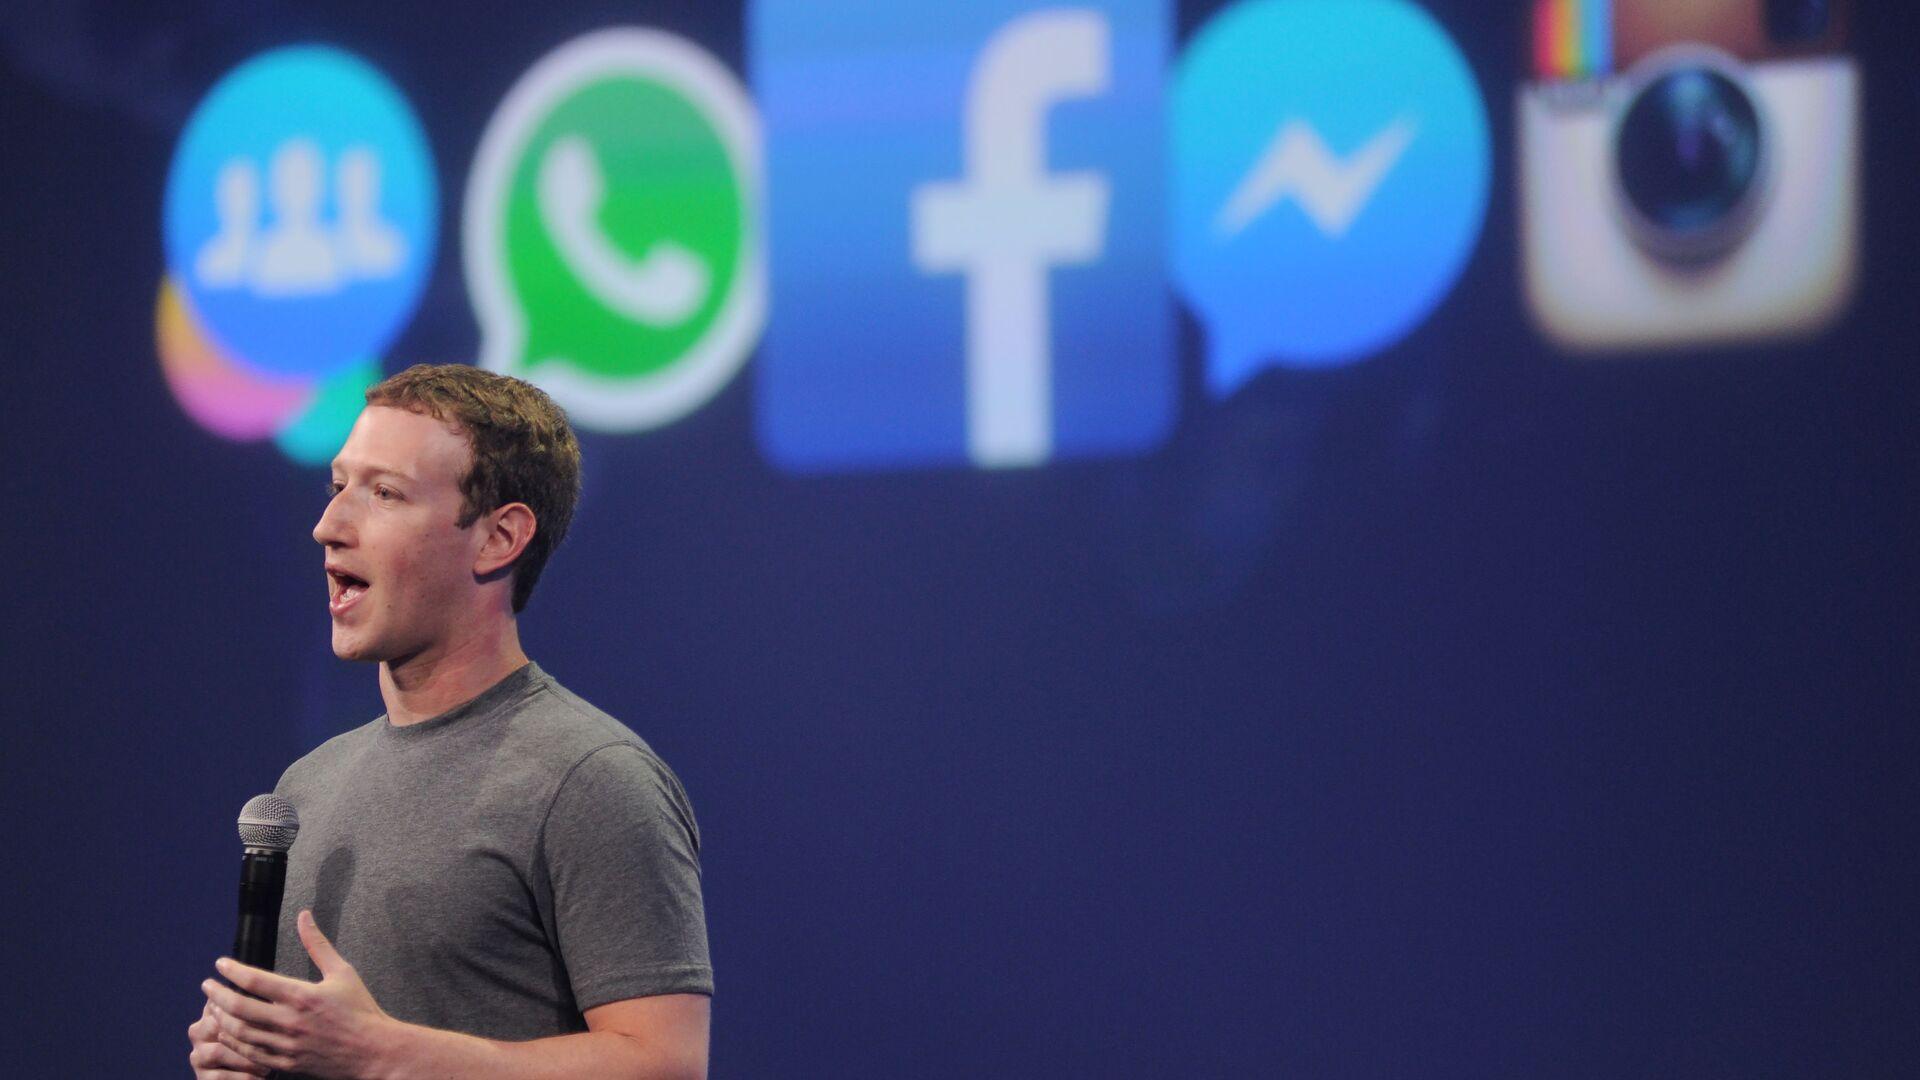 Šéf Facebooku Mark Zuckerberg - Sputnik Česká republika, 1920, 14.10.2021